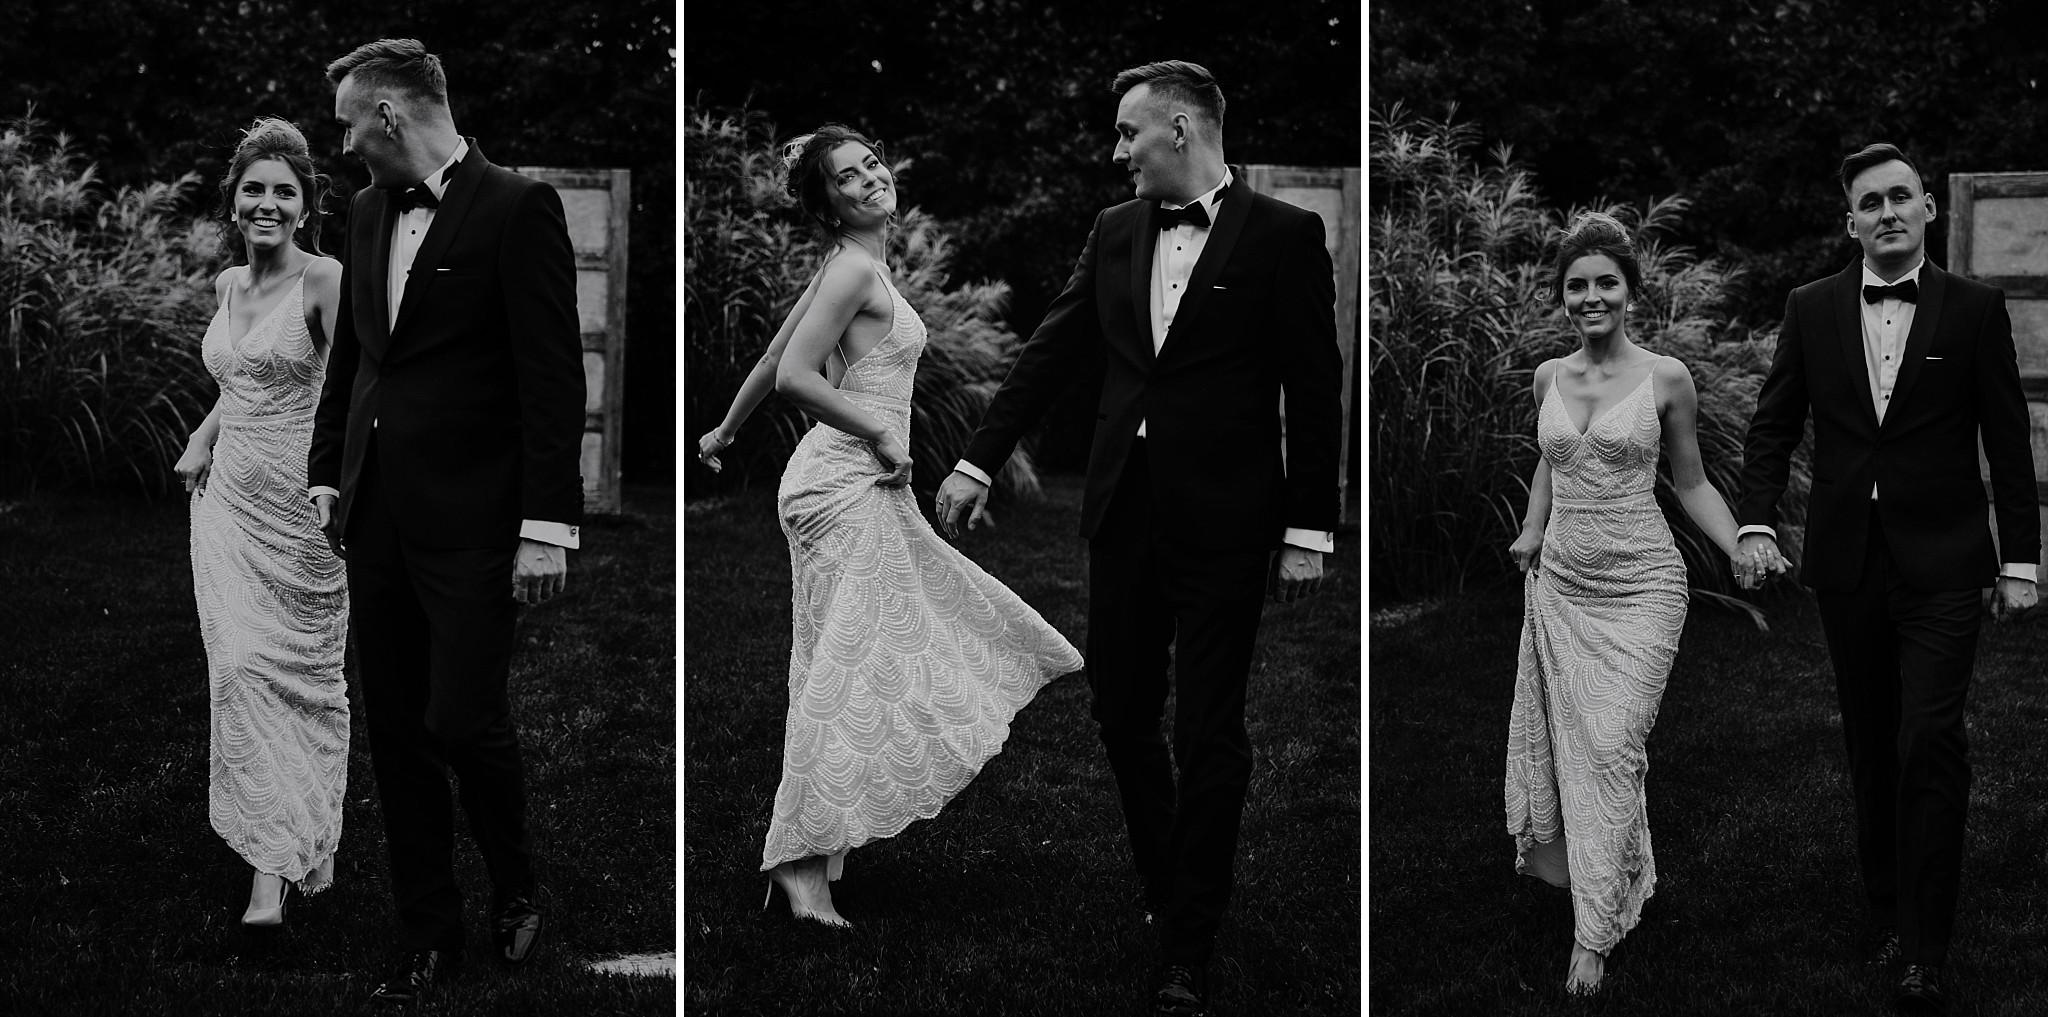 fotograf poznan wesele dobra truskawka piekne wesele pod poznaniem wesele w dobrej truskawce piekna para mloda slub marzen slub koronawirus slub listopad wesele koronawirus 369